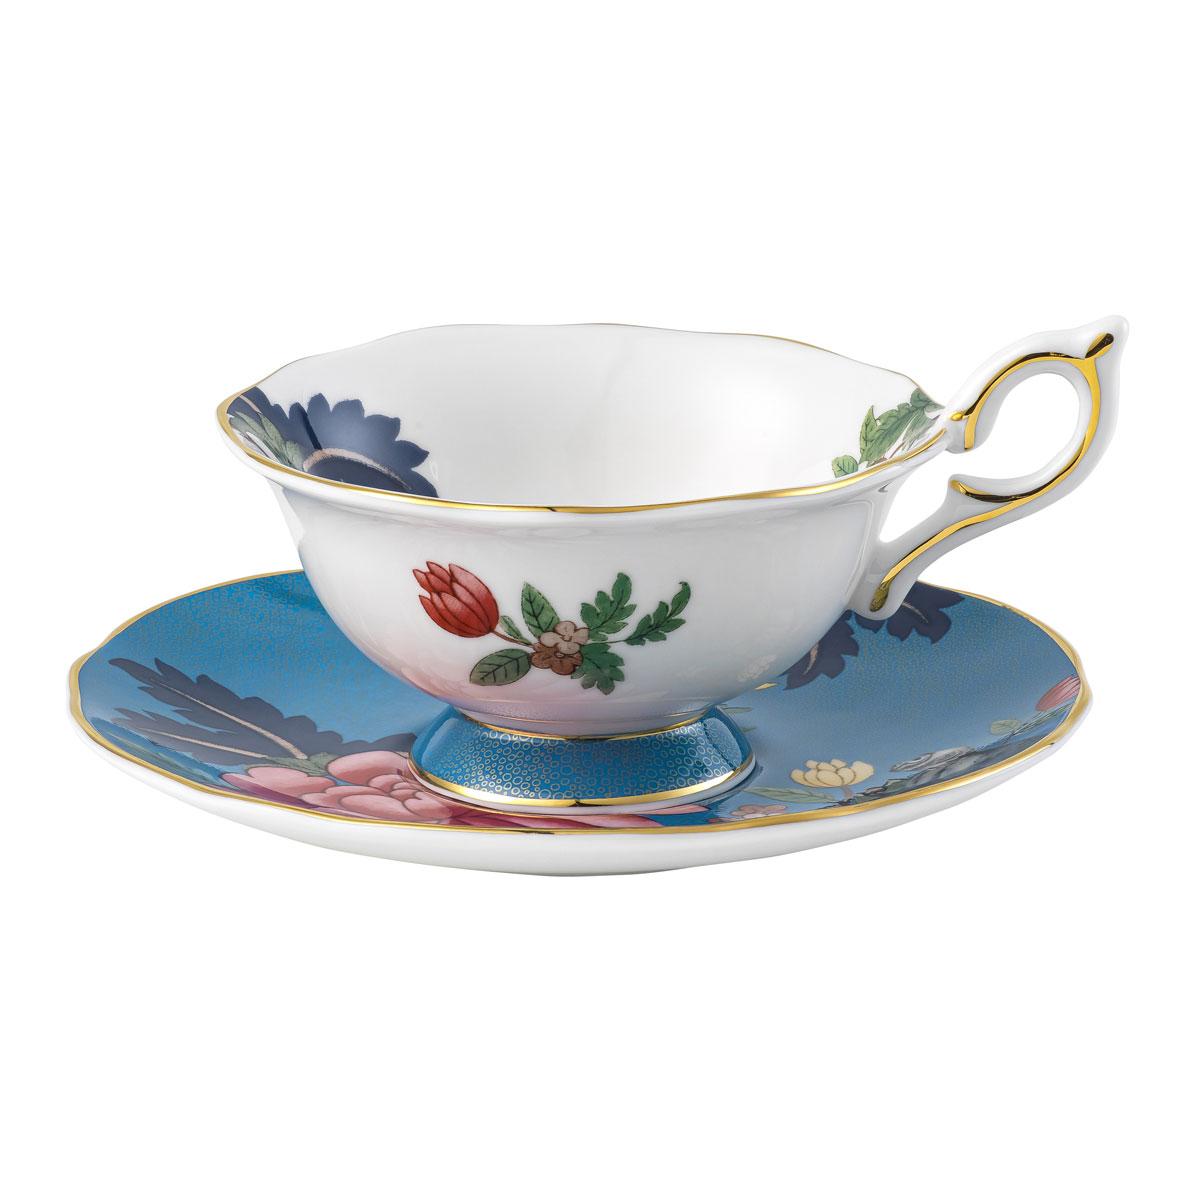 Wedgwood Wonderlust Sapphire Garden Teacup and Saucer